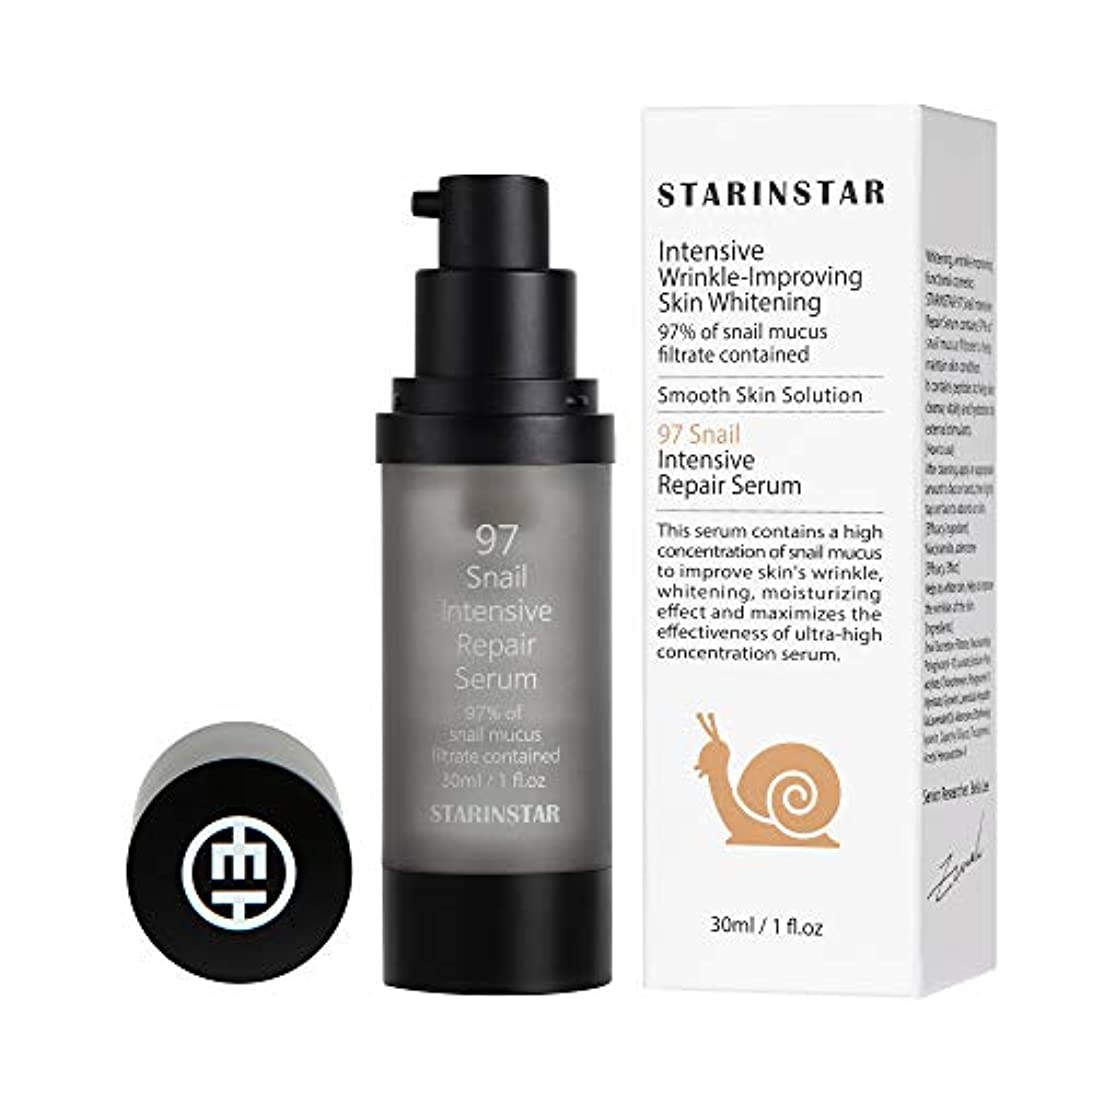 [STARINSTAR] 97 スネイルインテンシブリペアセラム 、ラベンダー油500ppmおよびペプチド100ppm、鼻汁粘液濾液の97%、30ml / 1fl.oz